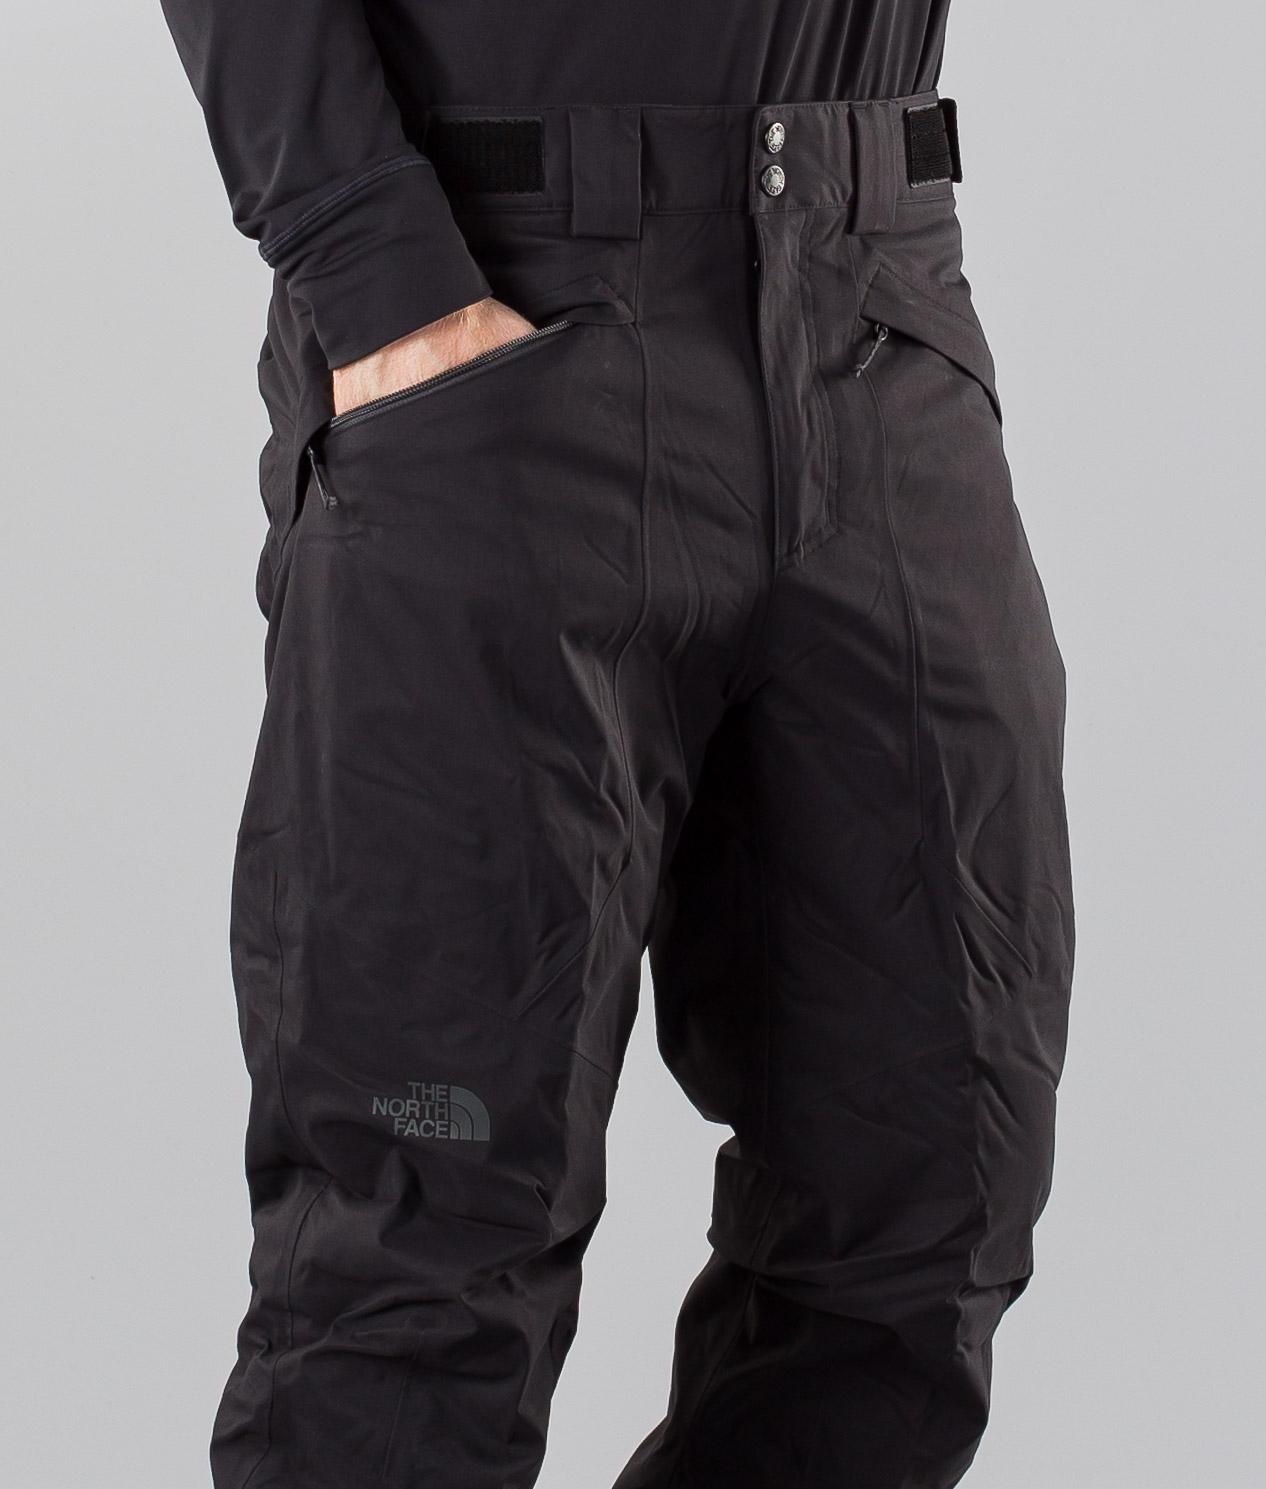 The Face Pantalon De Presena Black Ski North Chez SrqRASw